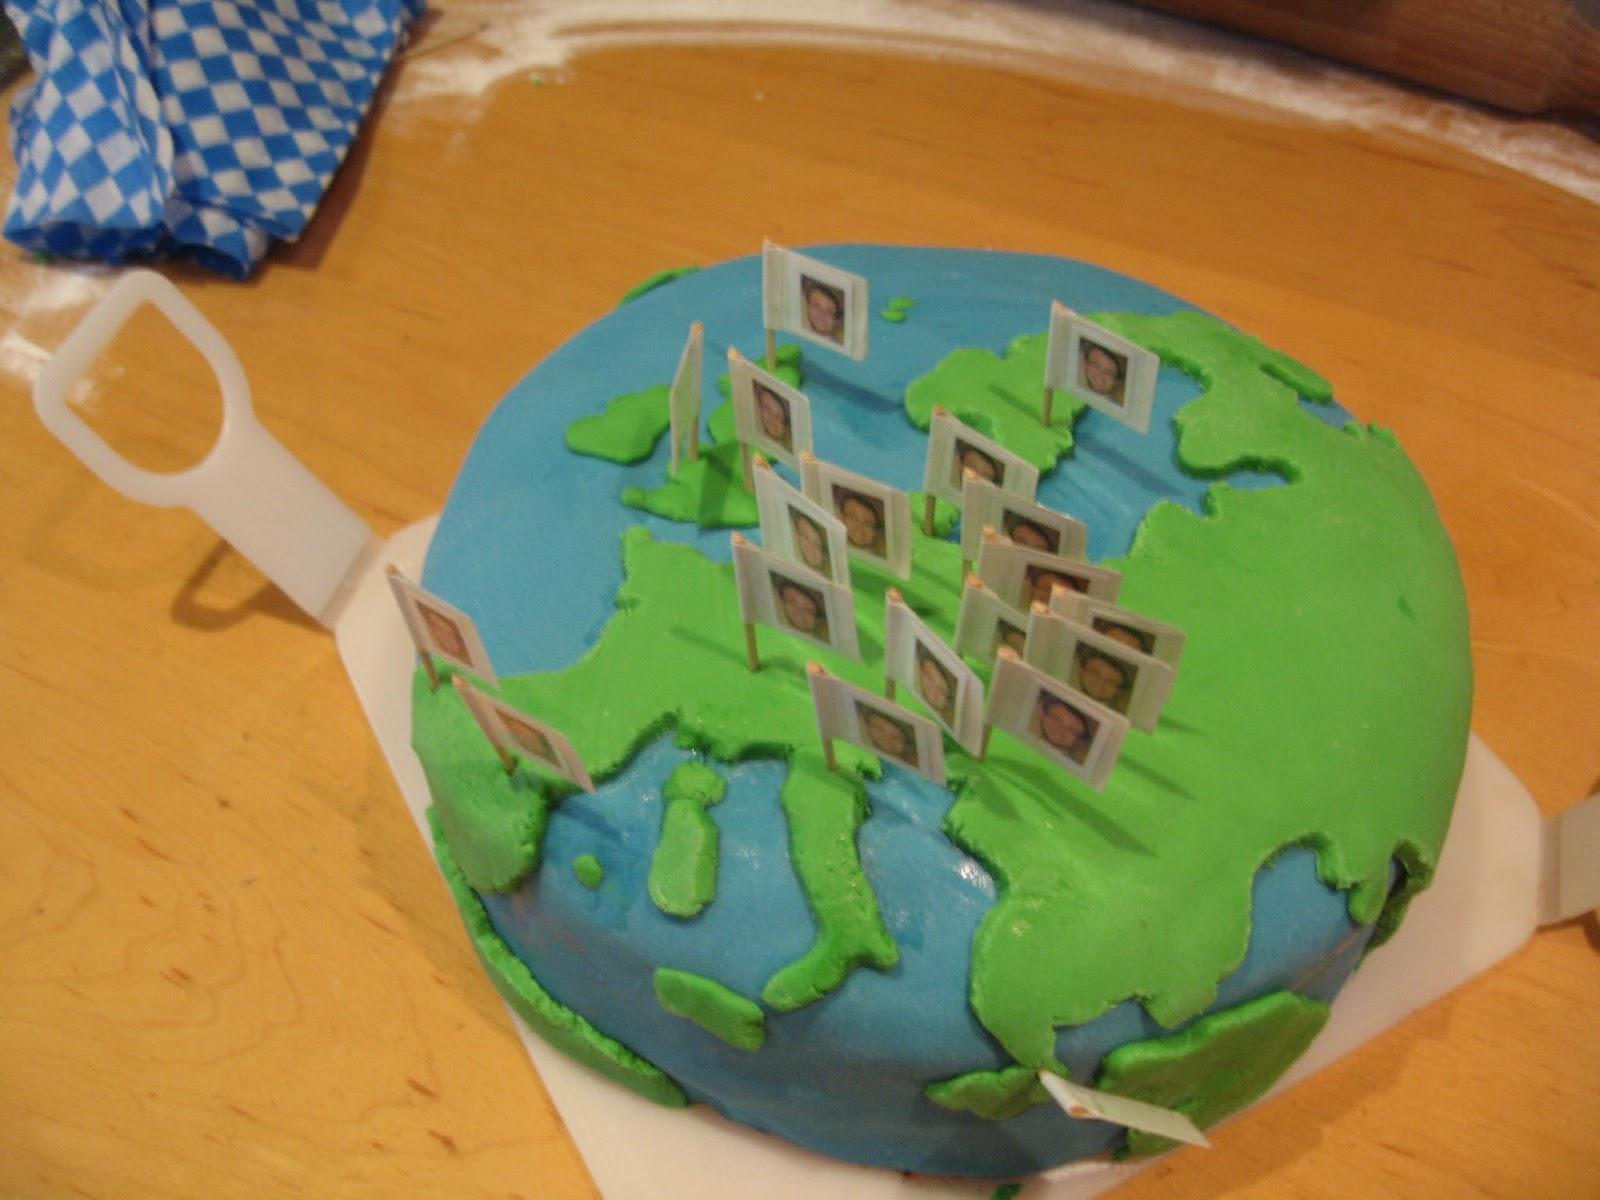 Cake Decor And More E U : Comics and Cakery: Europe Cake